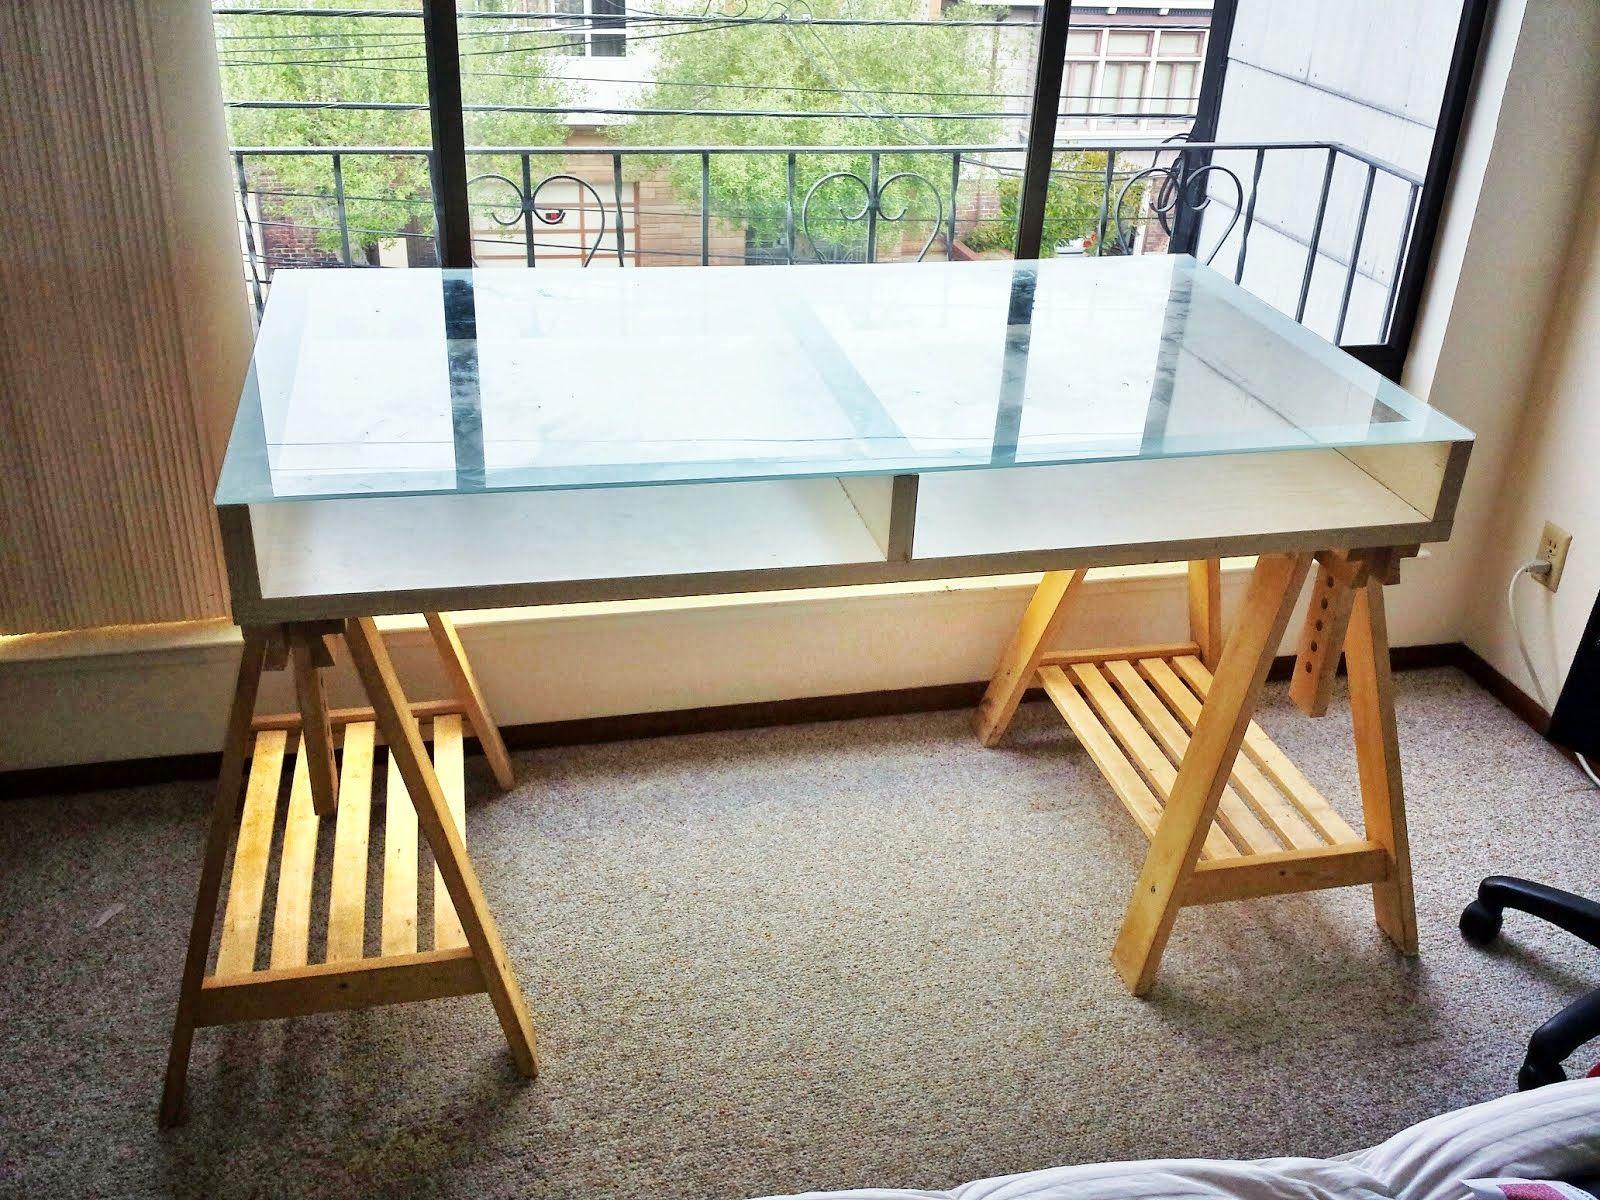 Magiker Adjustable Desk Ikea Hackers Ikea Desk Ikea Glass Table Top Ikea Glass Table